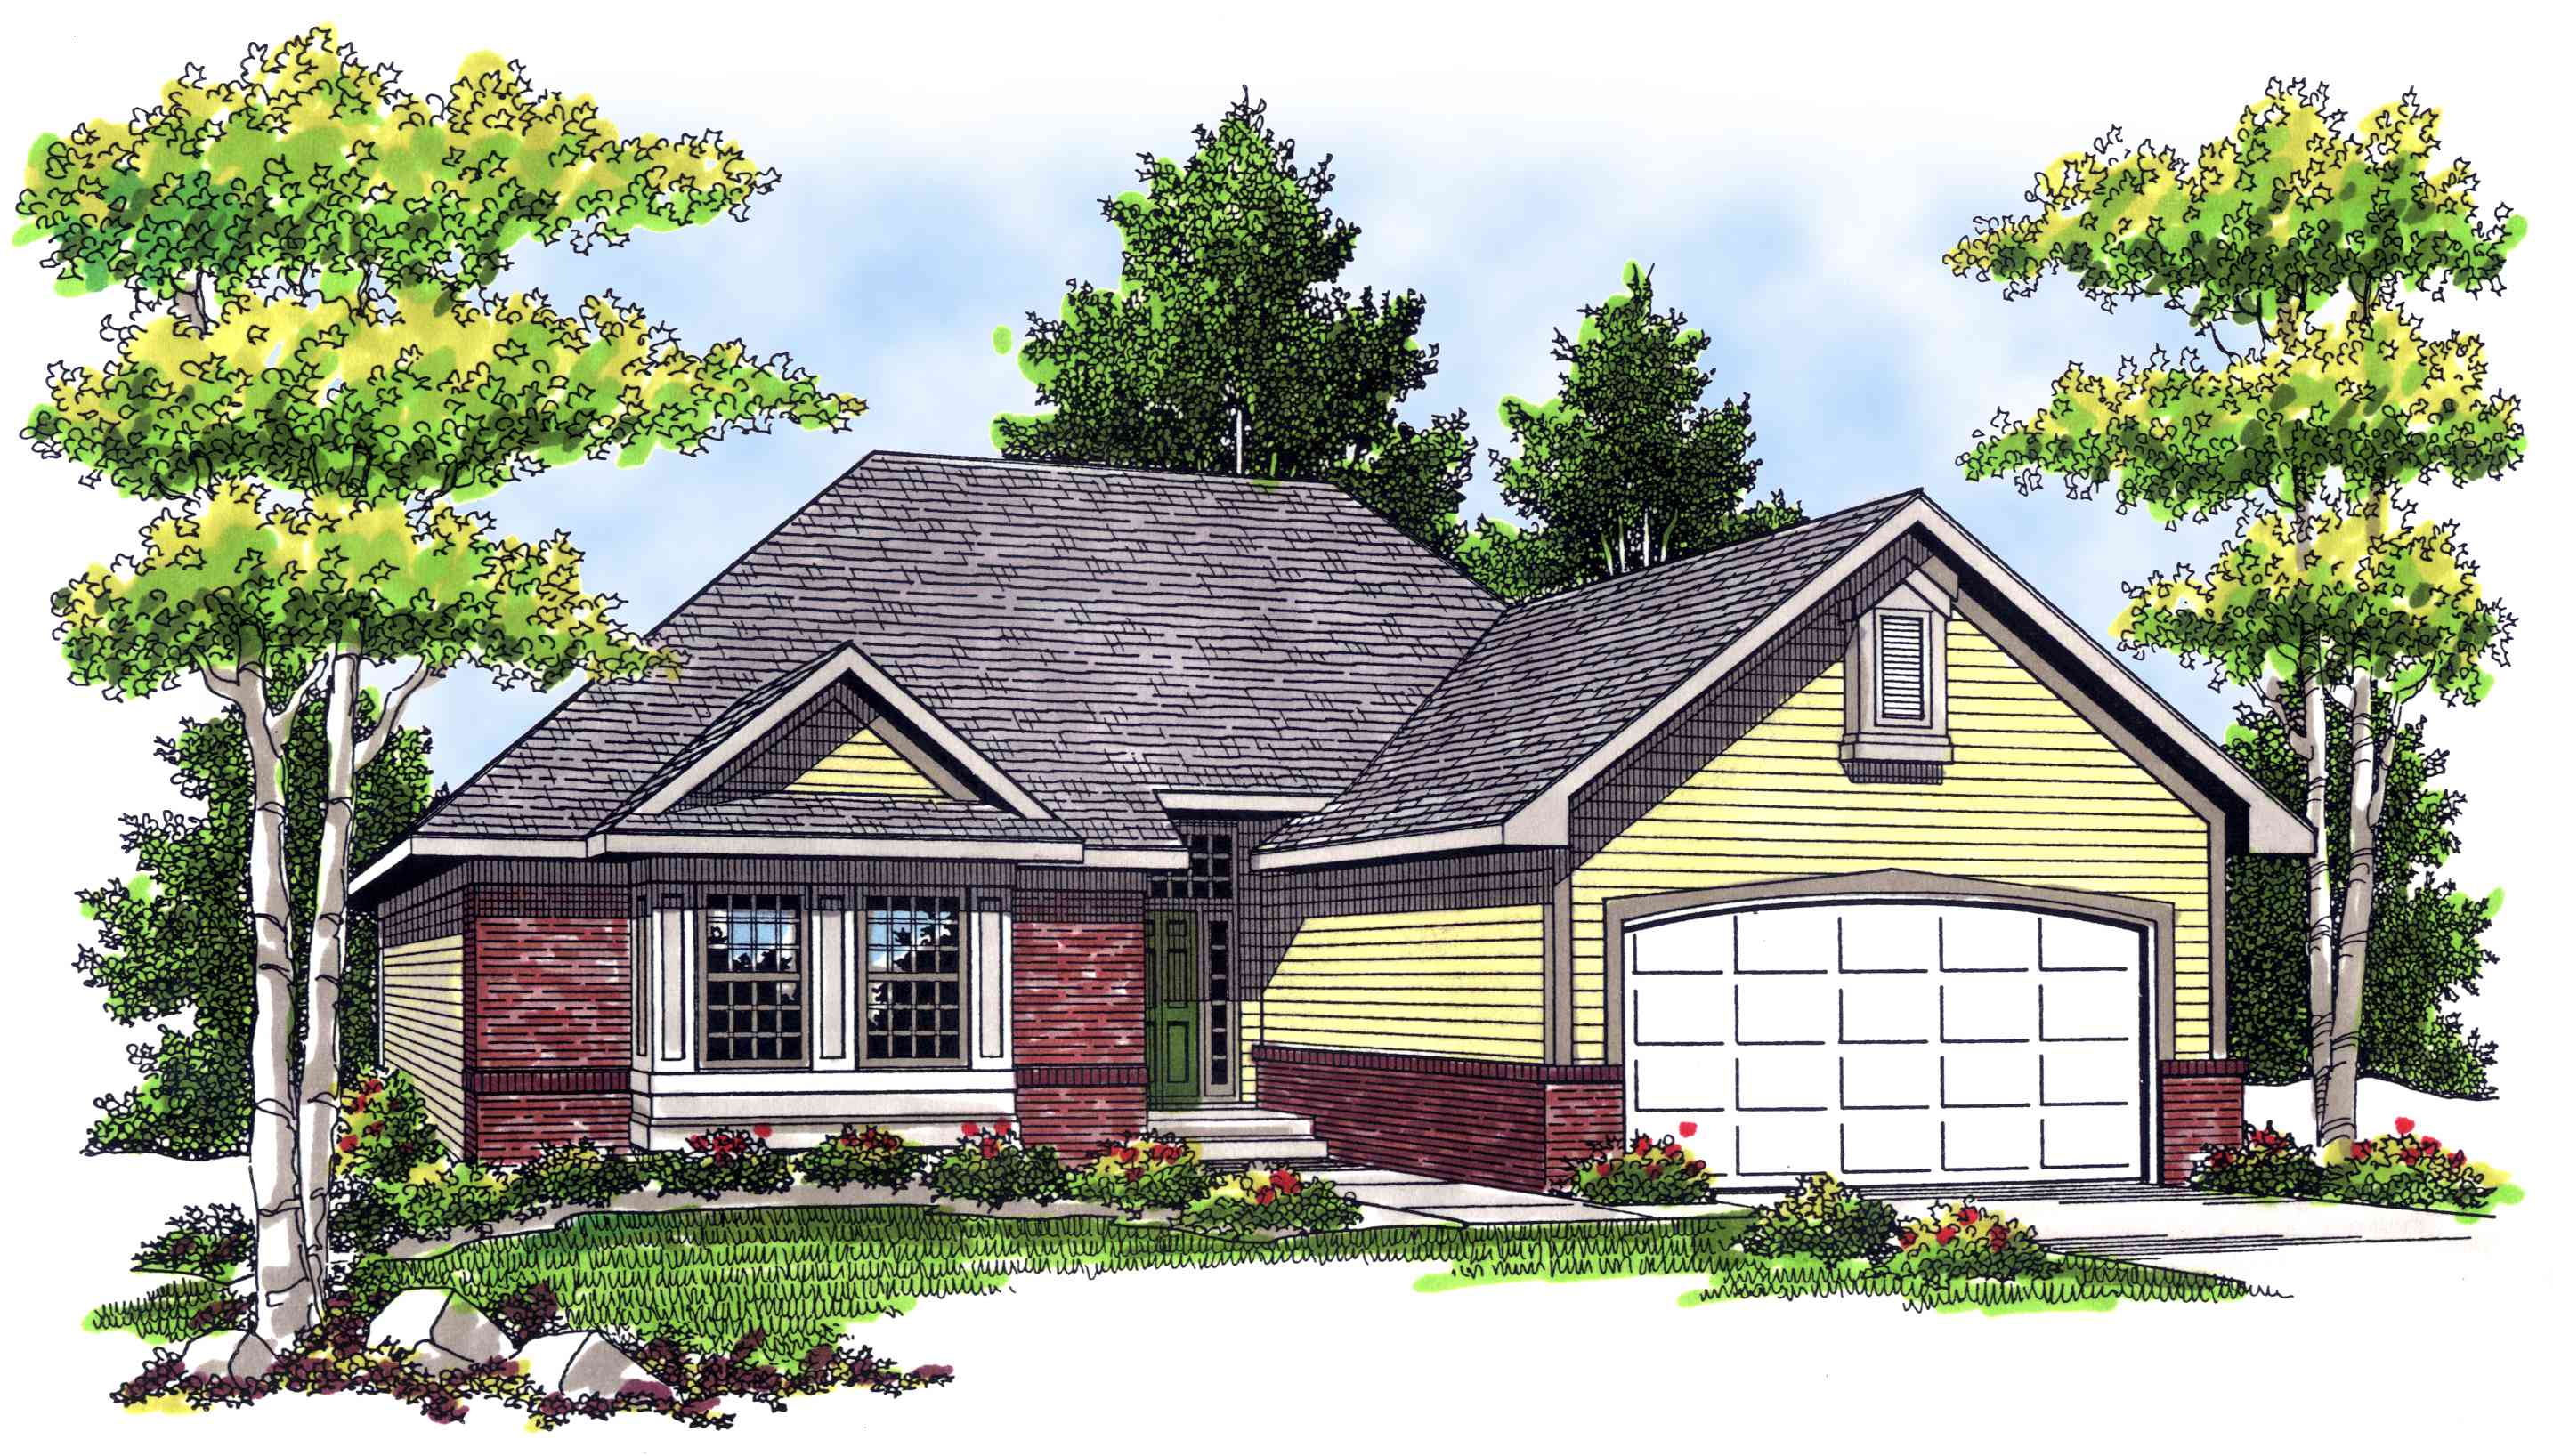 Cozy three bedroom ranch 89545ah architectural designs for 3 bedroom ranch house